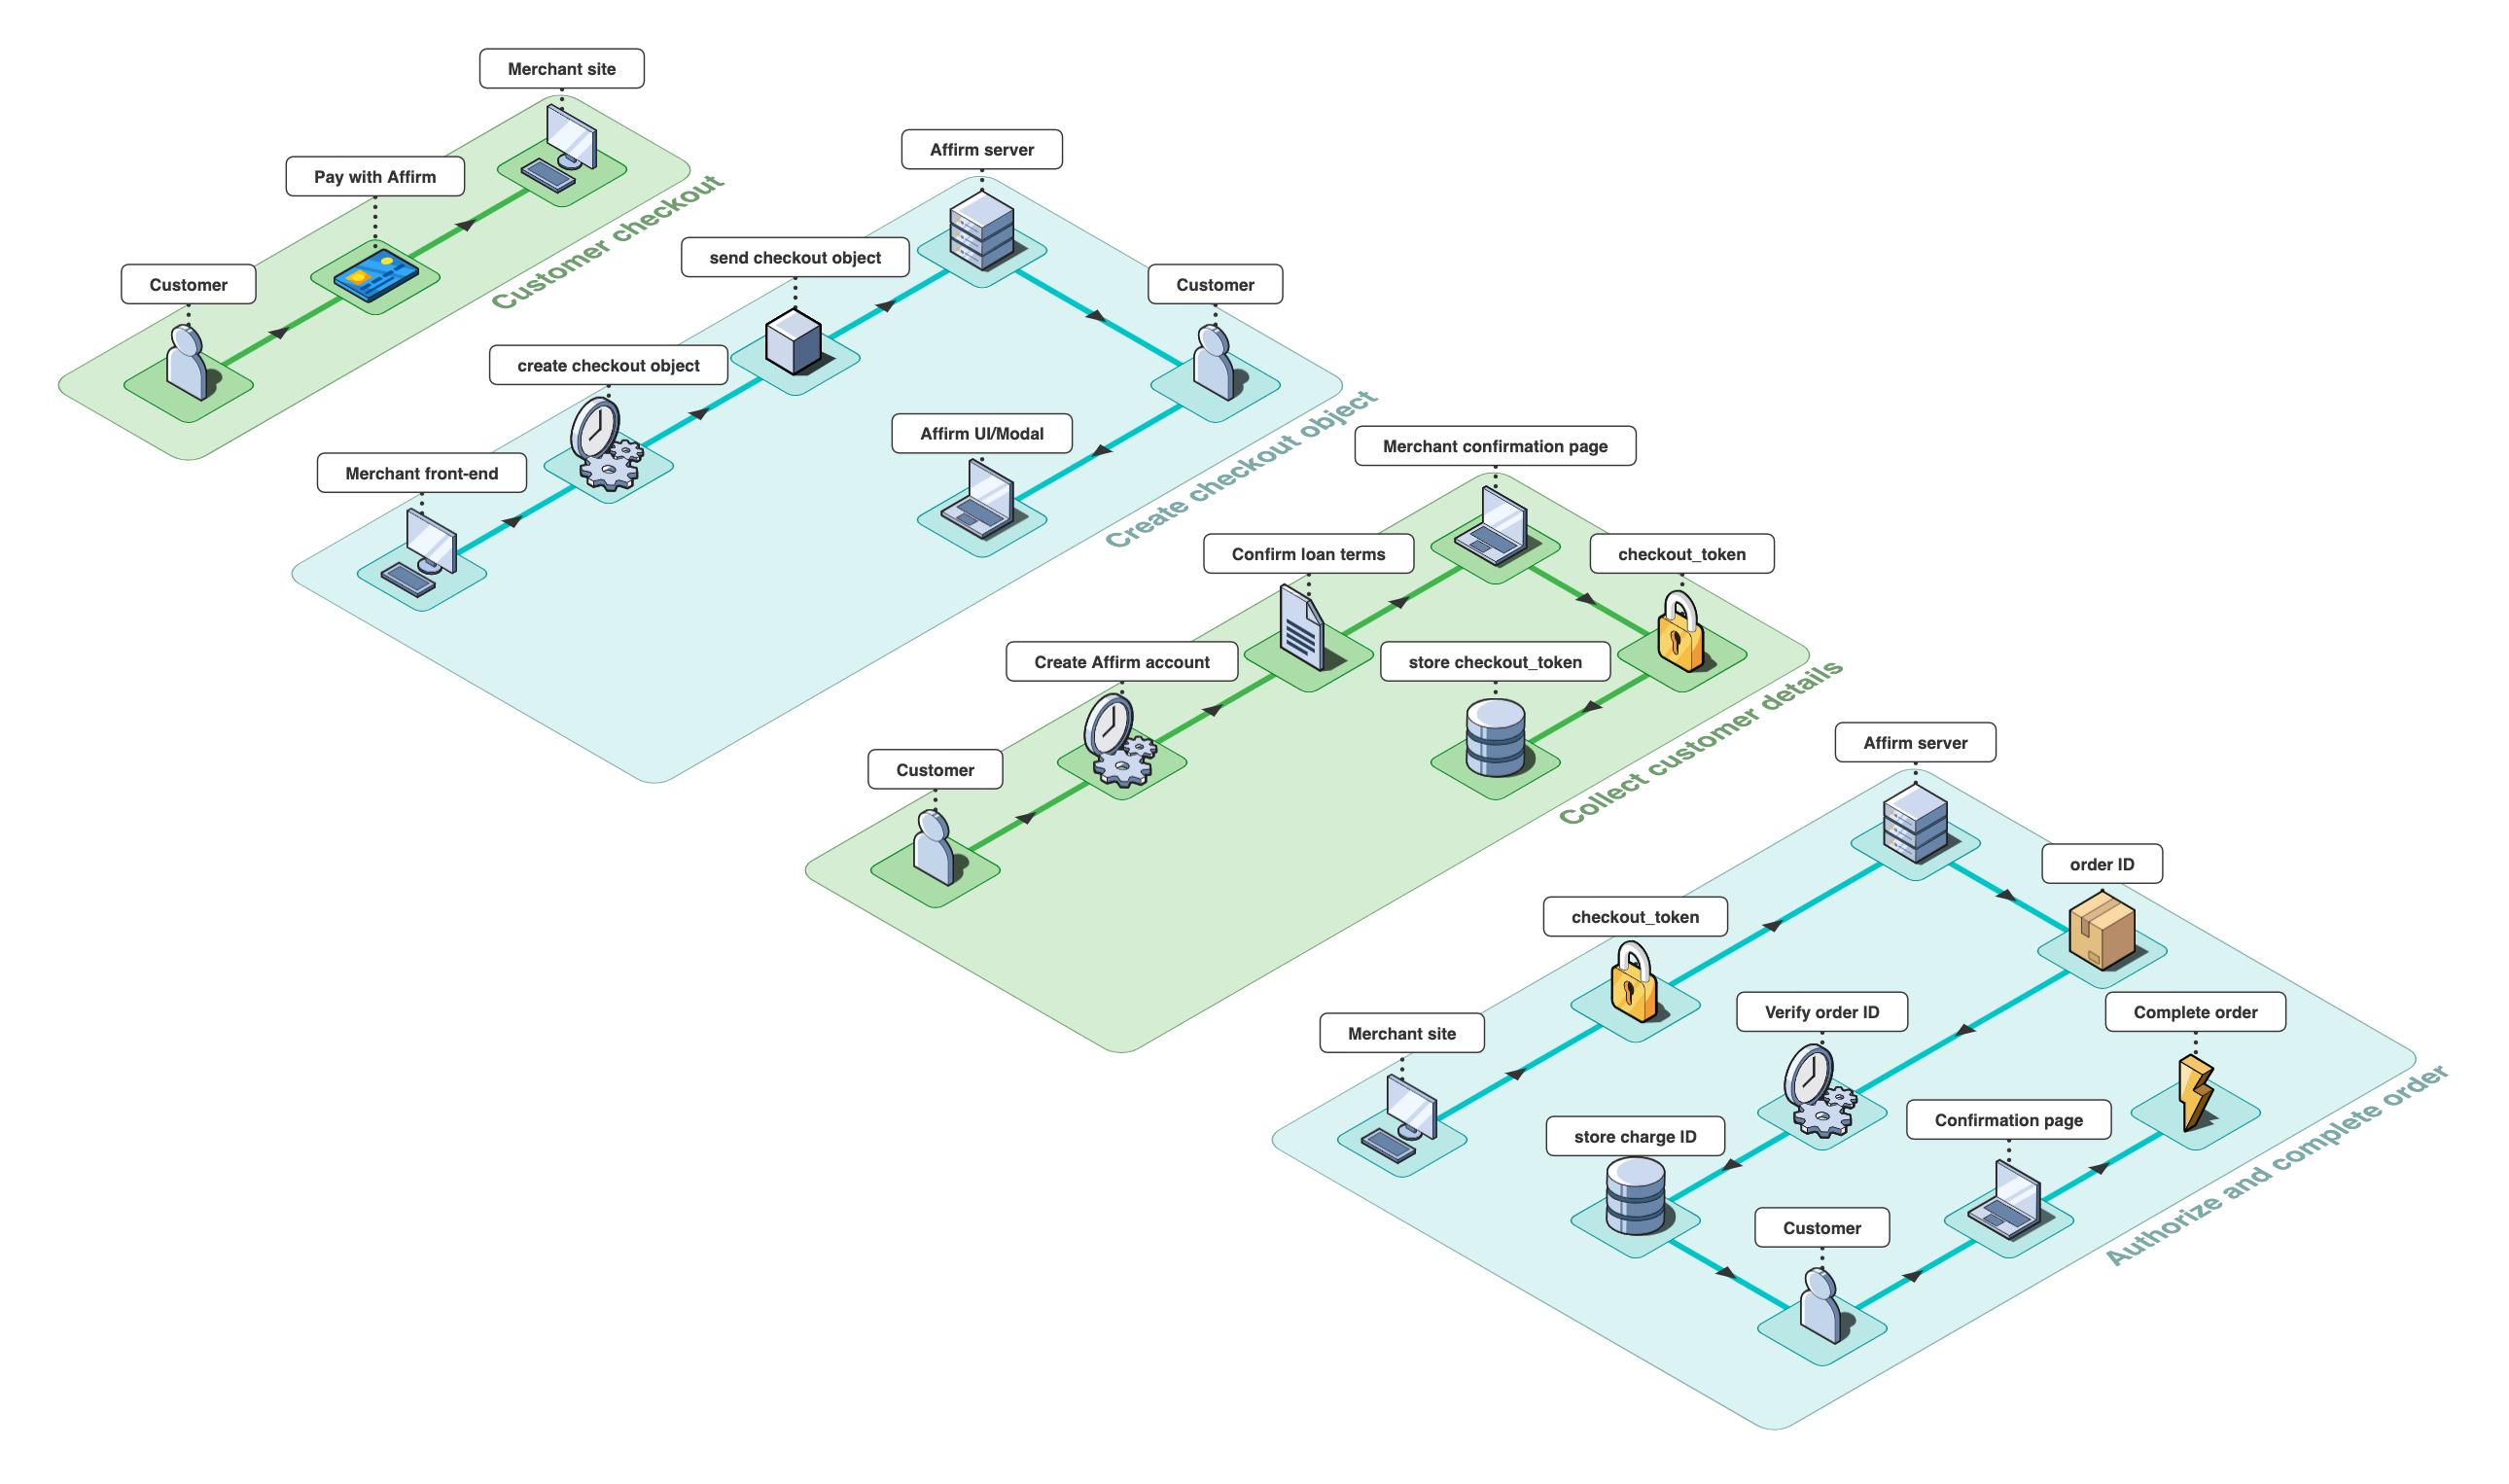 Complete Affirm transaction flow